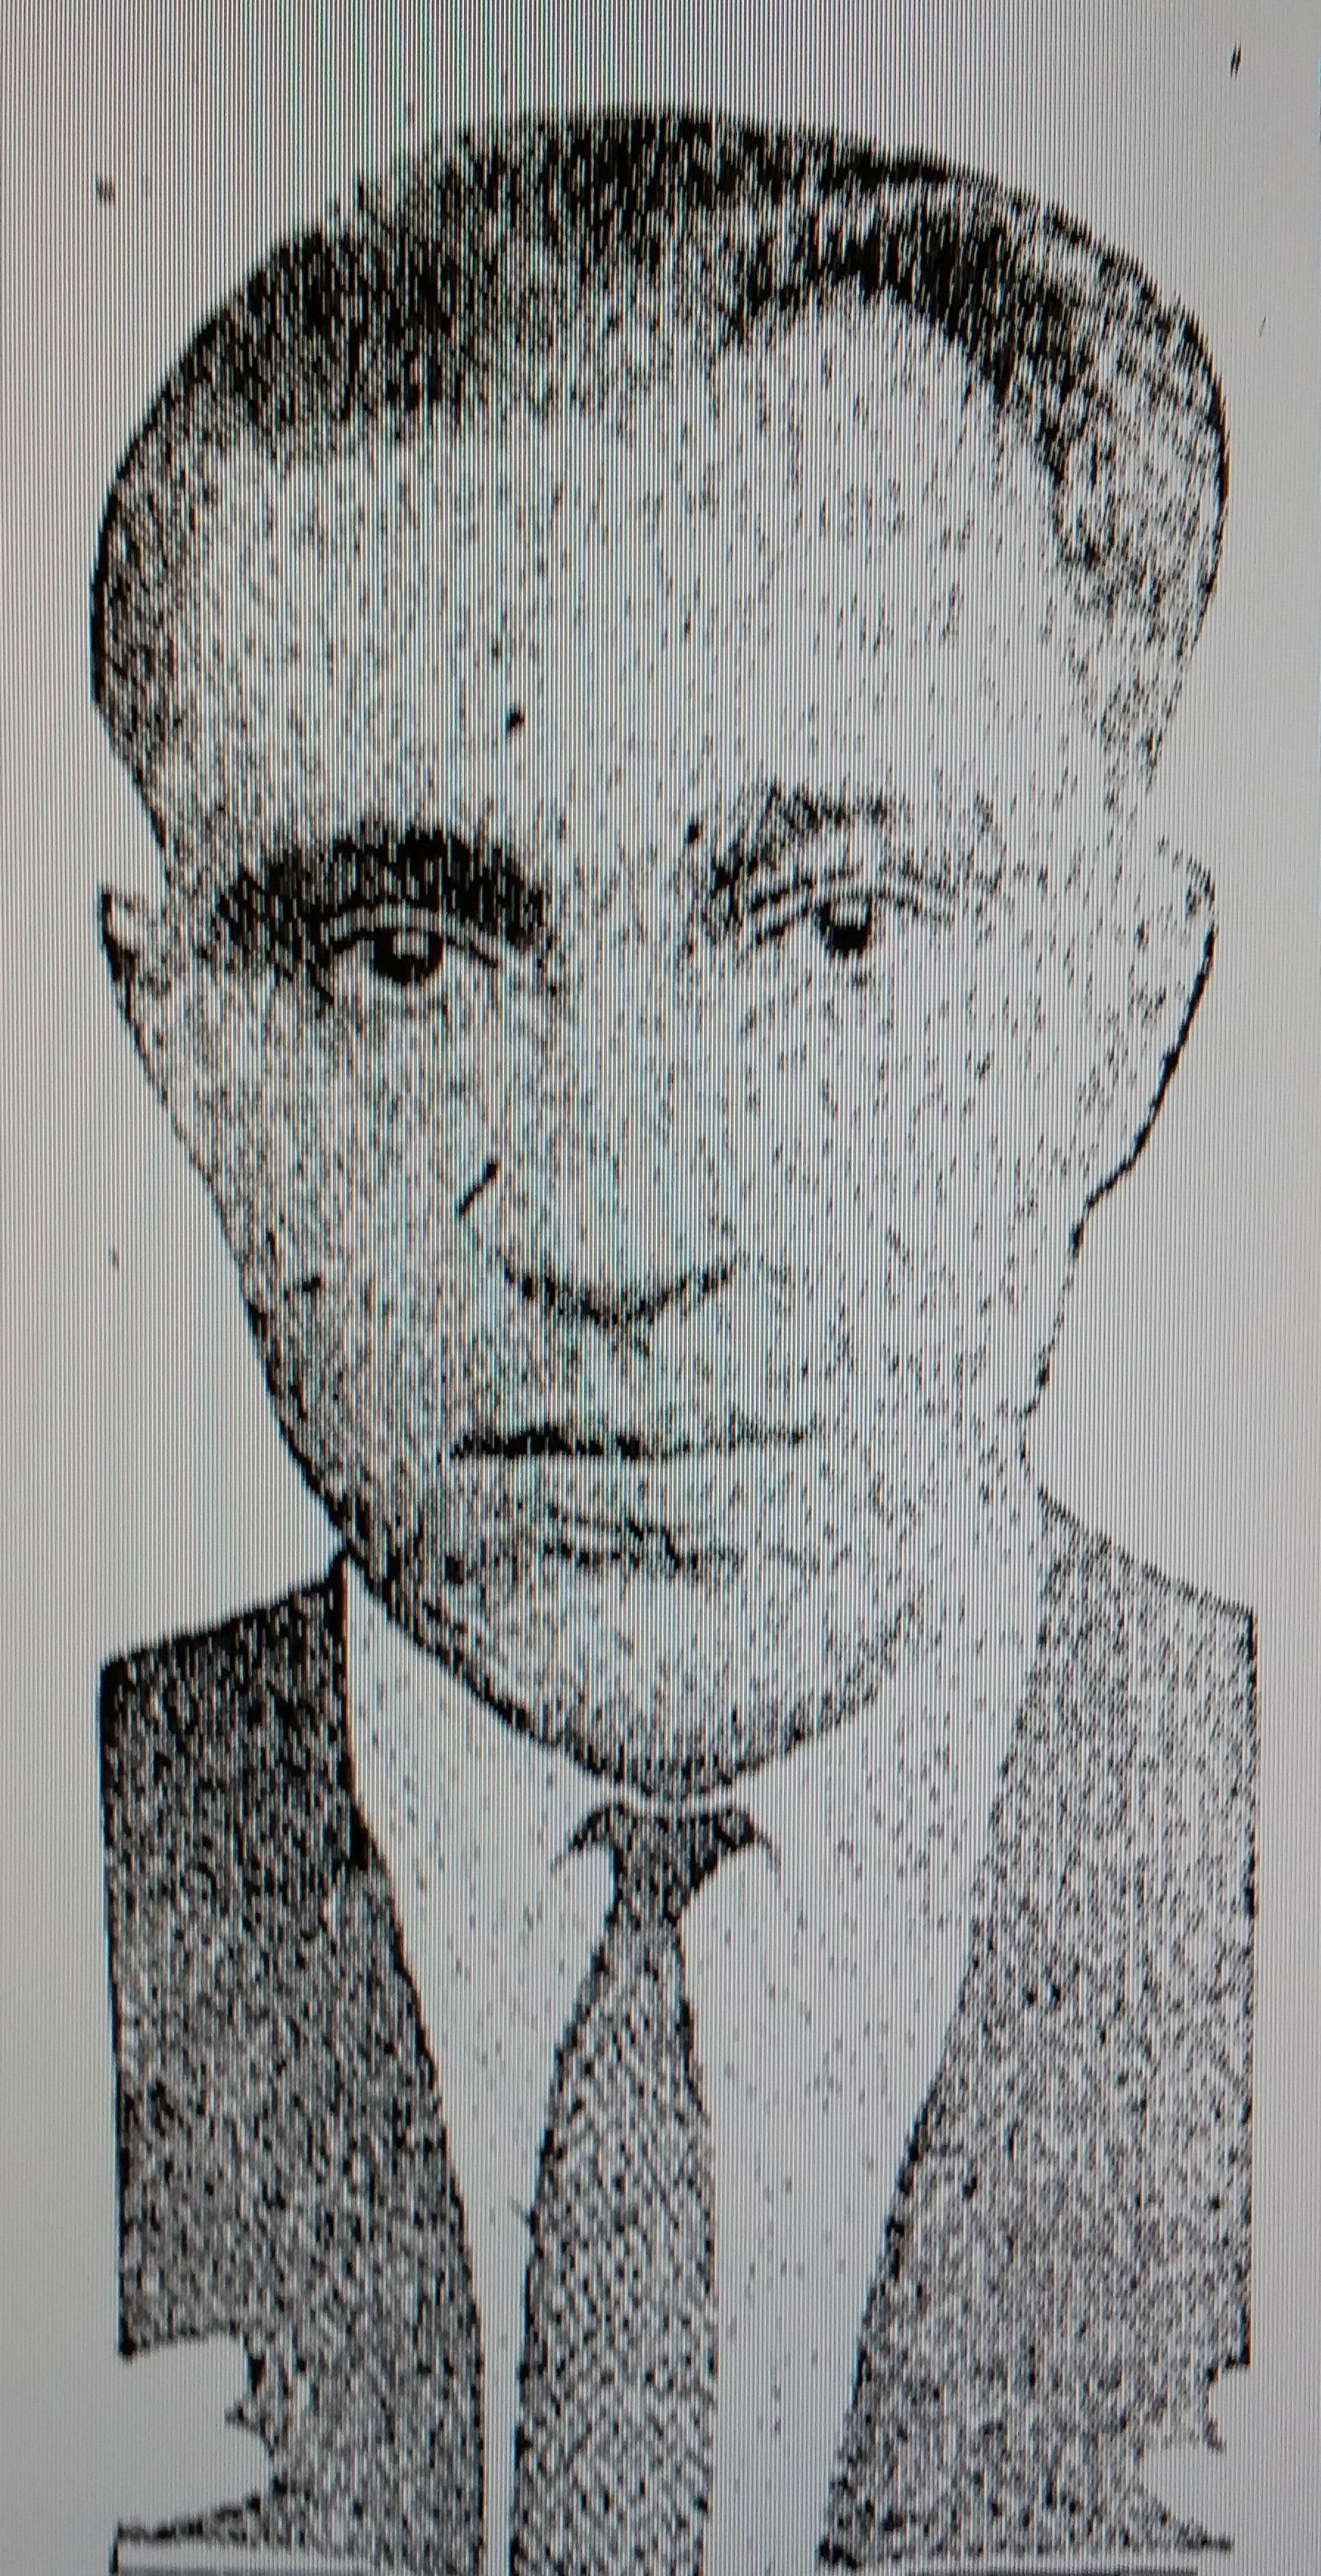 Policeman Herbert Klade   Los Angeles Police Department, California